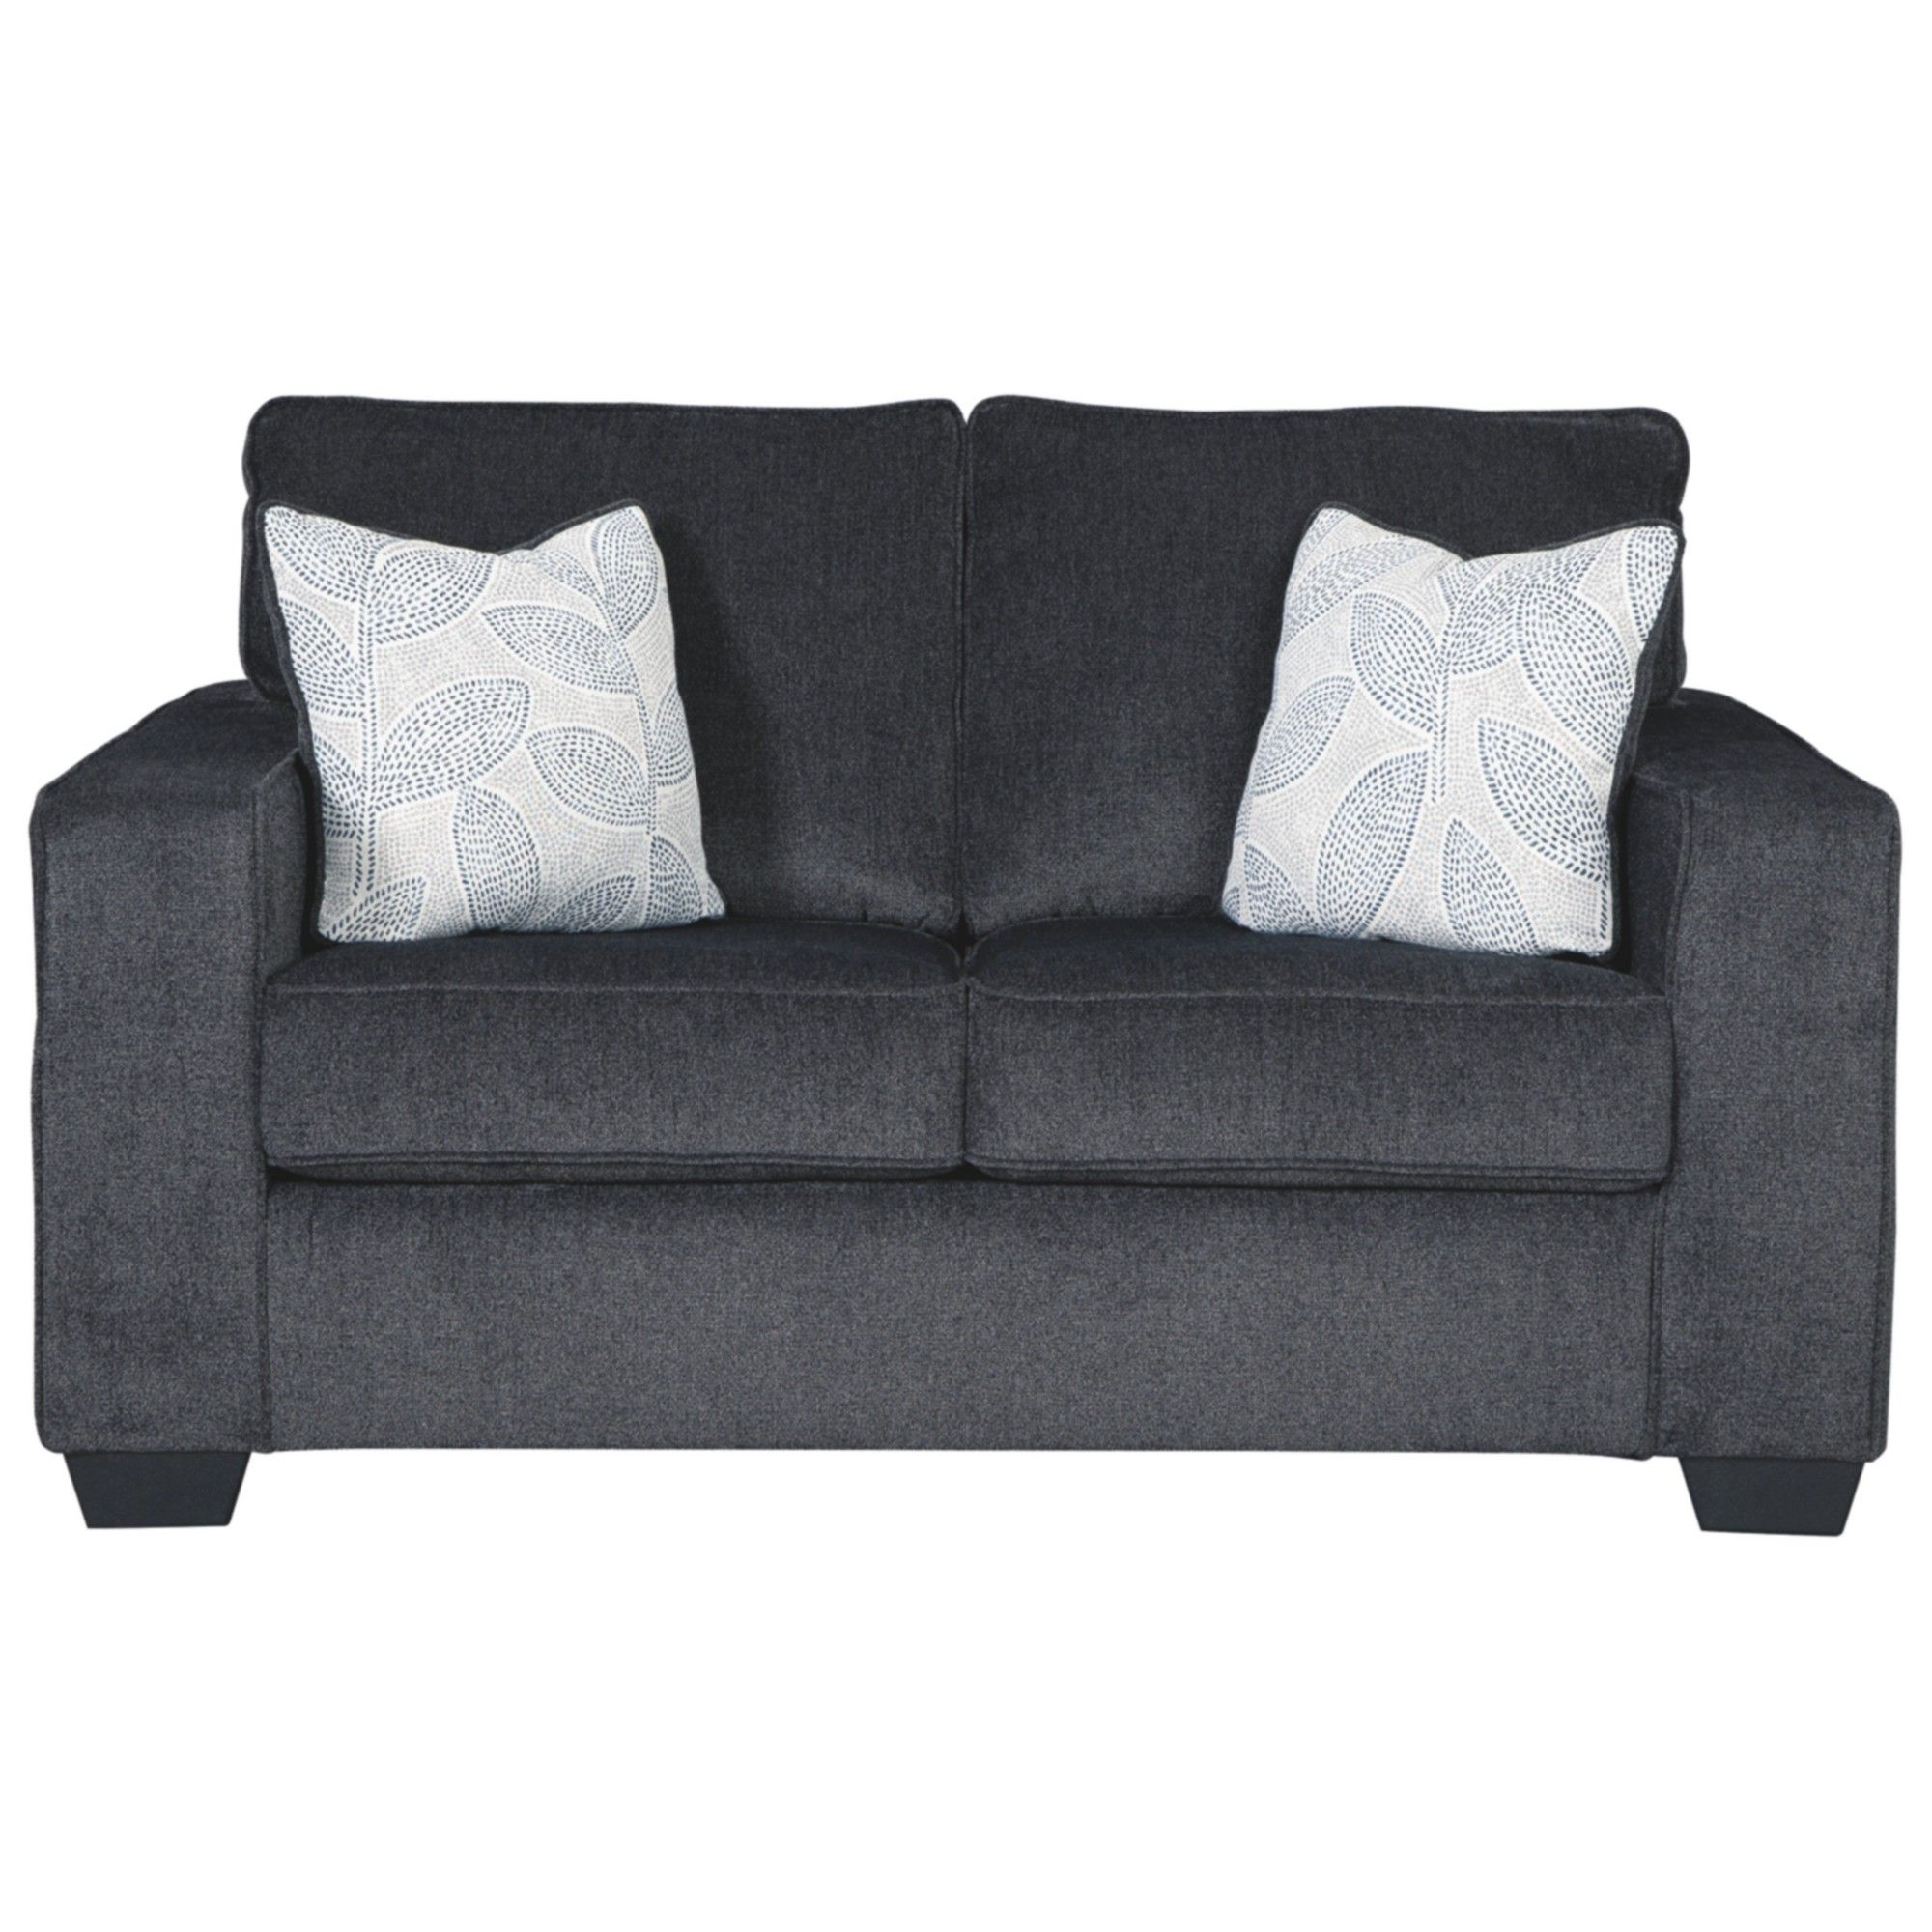 Remarkable Signature Design By Ashley Altari Loveseat Slate Gray Ibusinesslaw Wood Chair Design Ideas Ibusinesslaworg